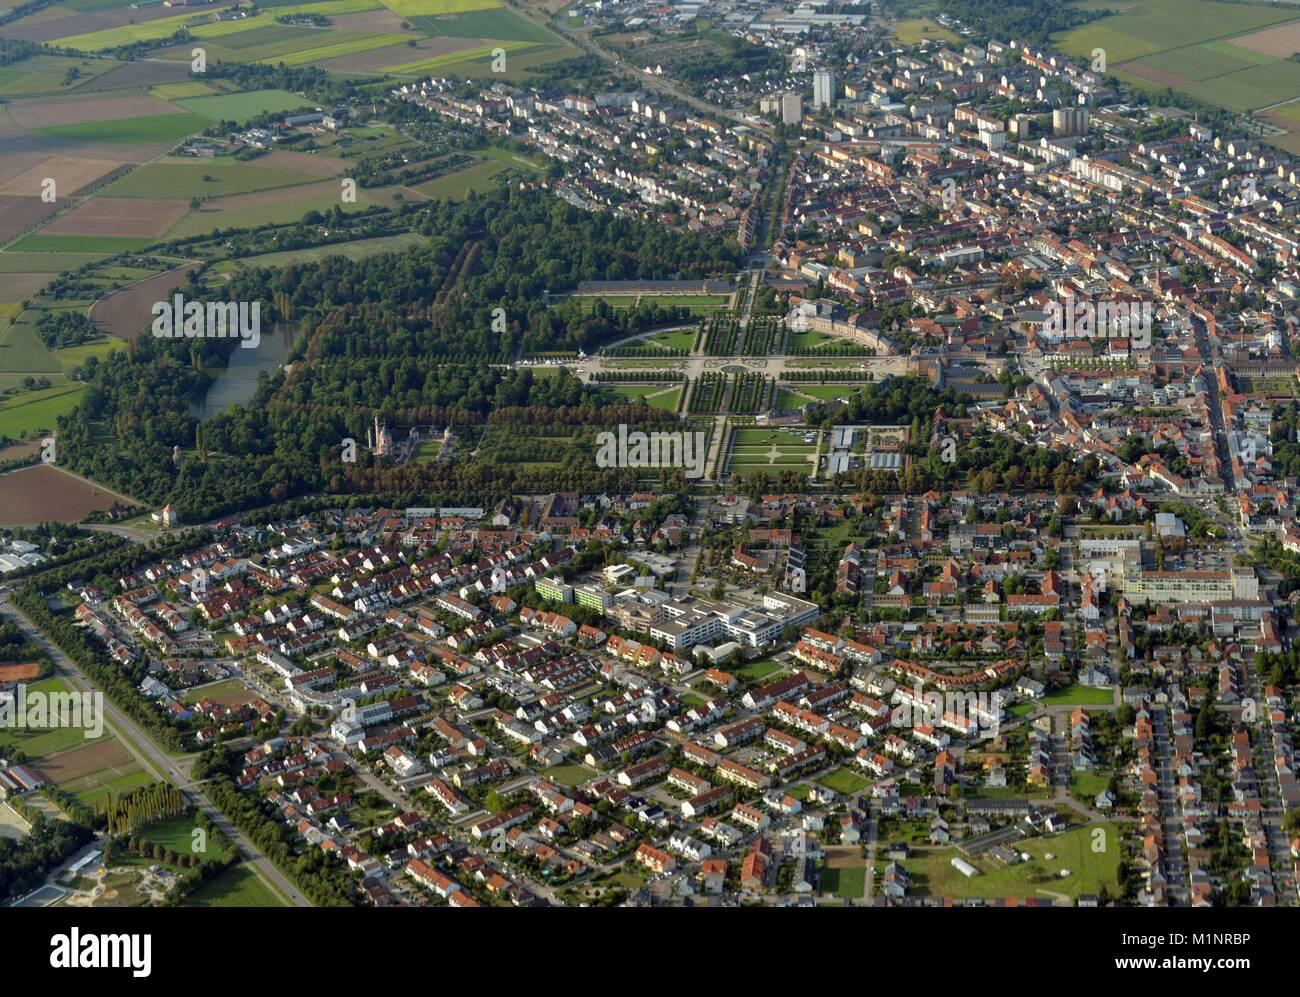 Schwetzingen palace and garden with city of Schwetzingen  Germany, September 01,2017 | usage worldwide - Stock Image